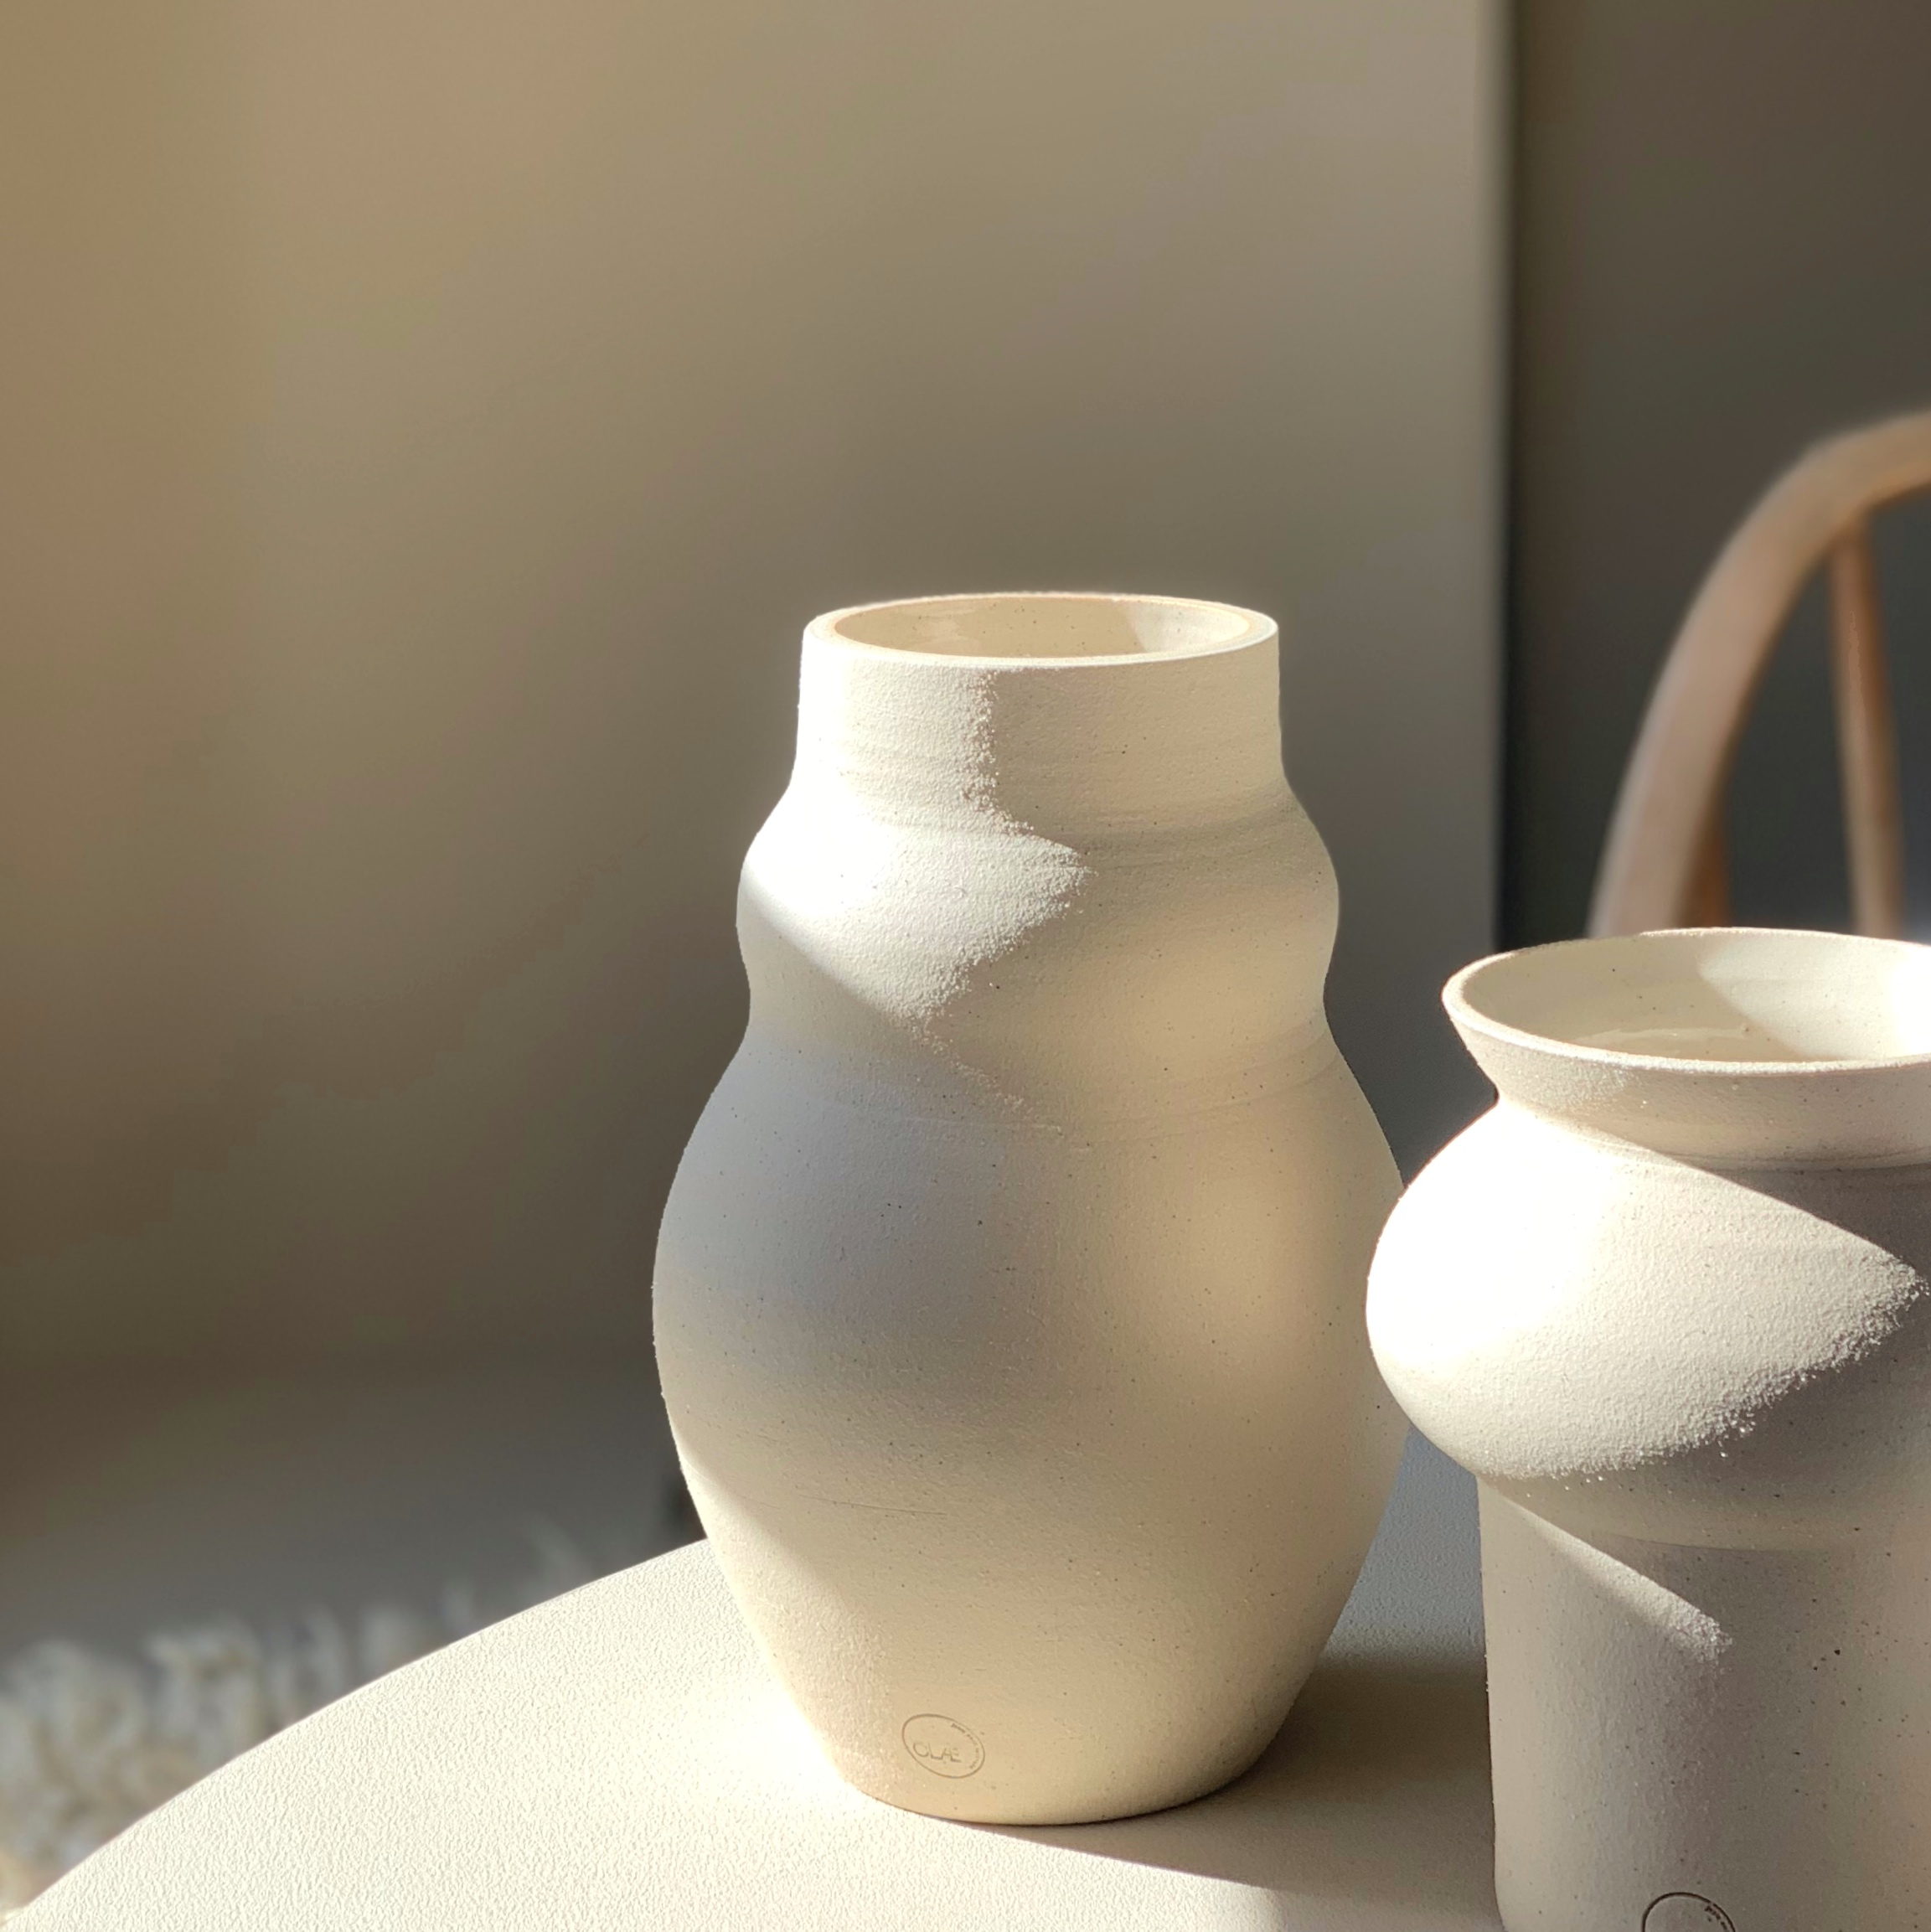 White stoneware vases